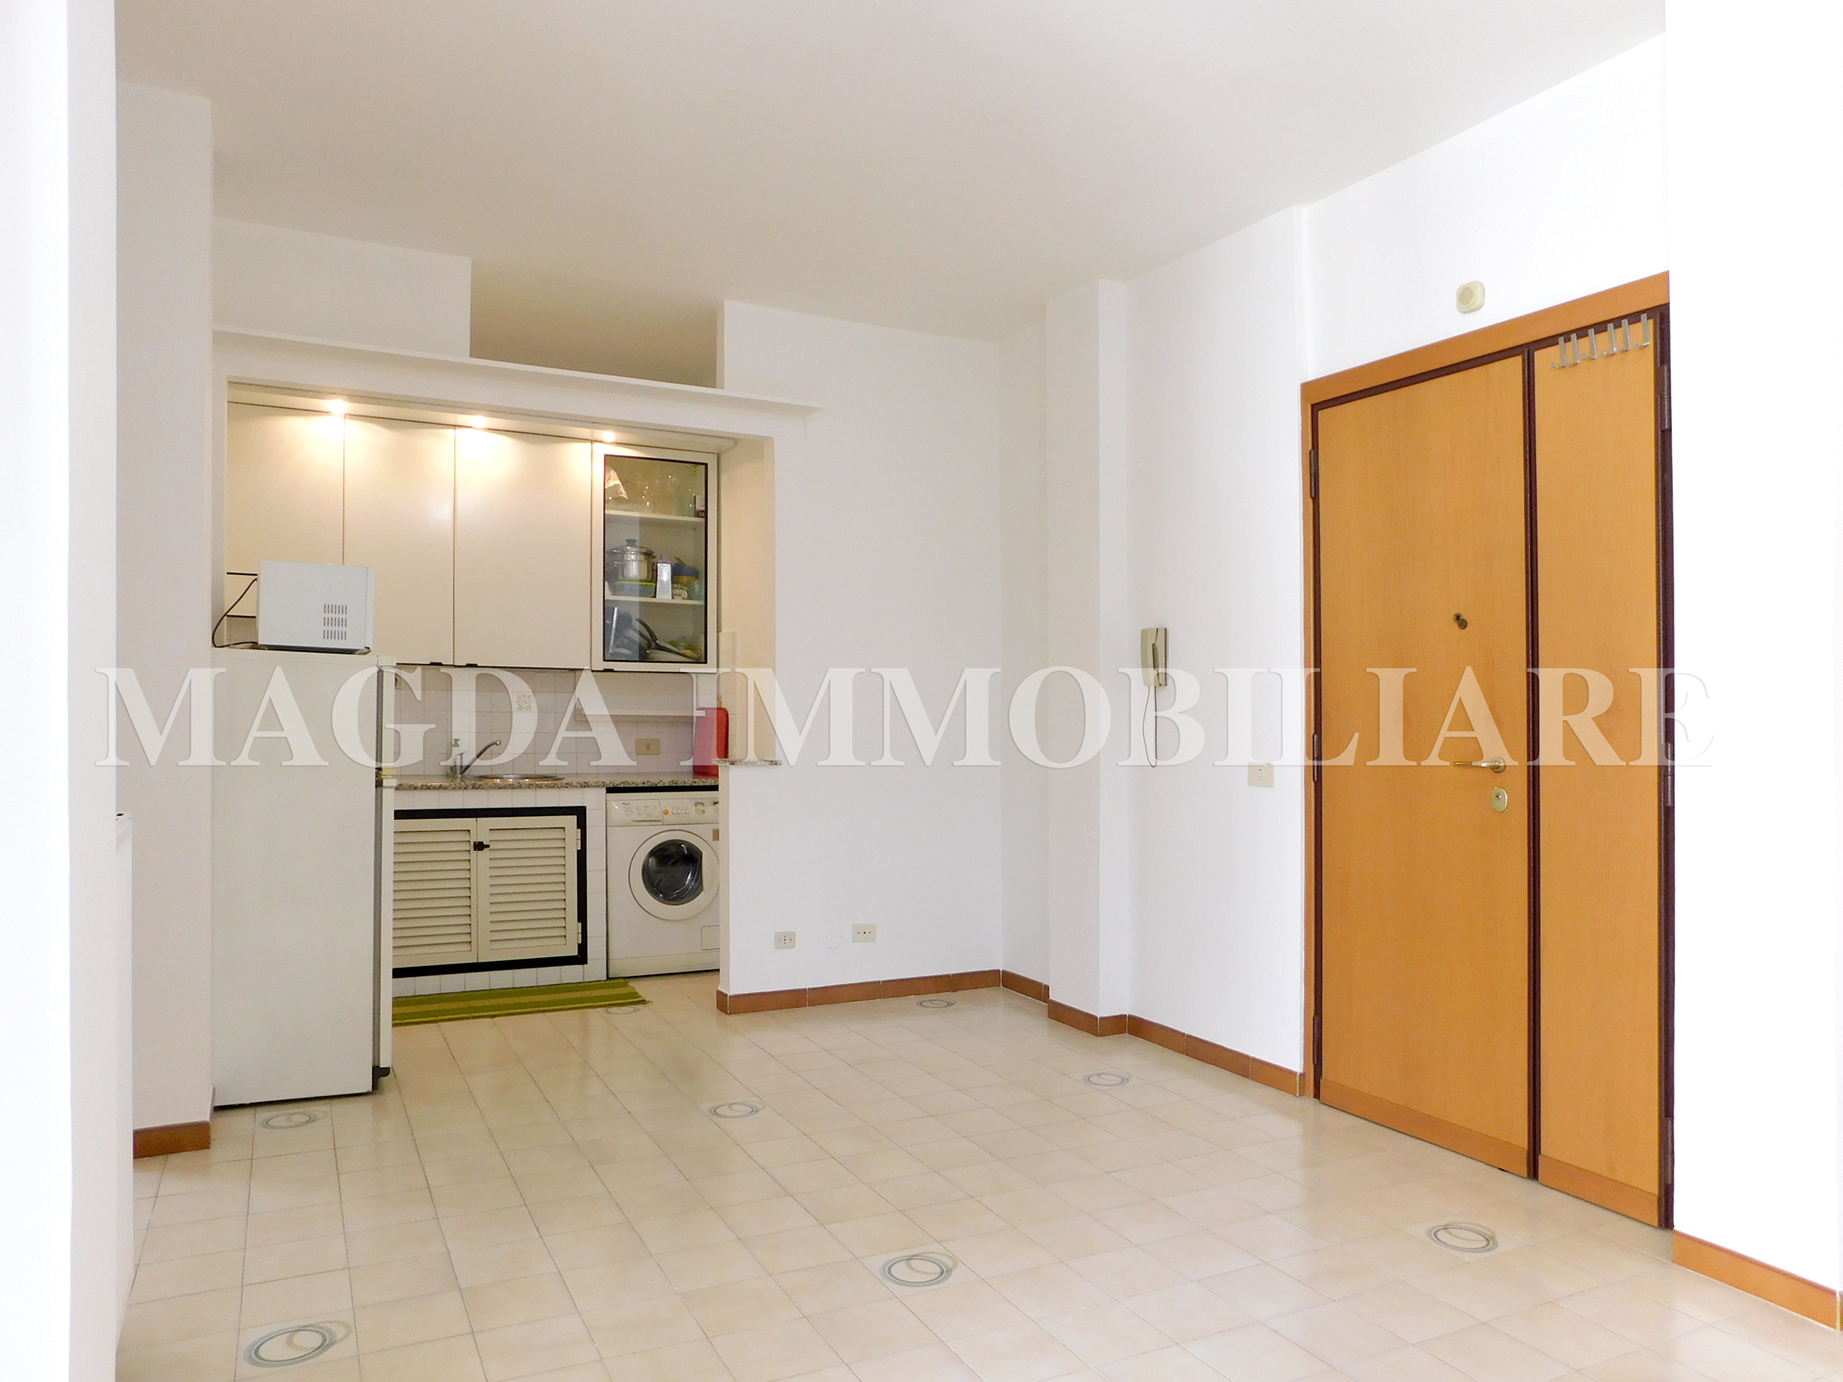 Appartamento a Cerenova - Via dei Tirreni, 6